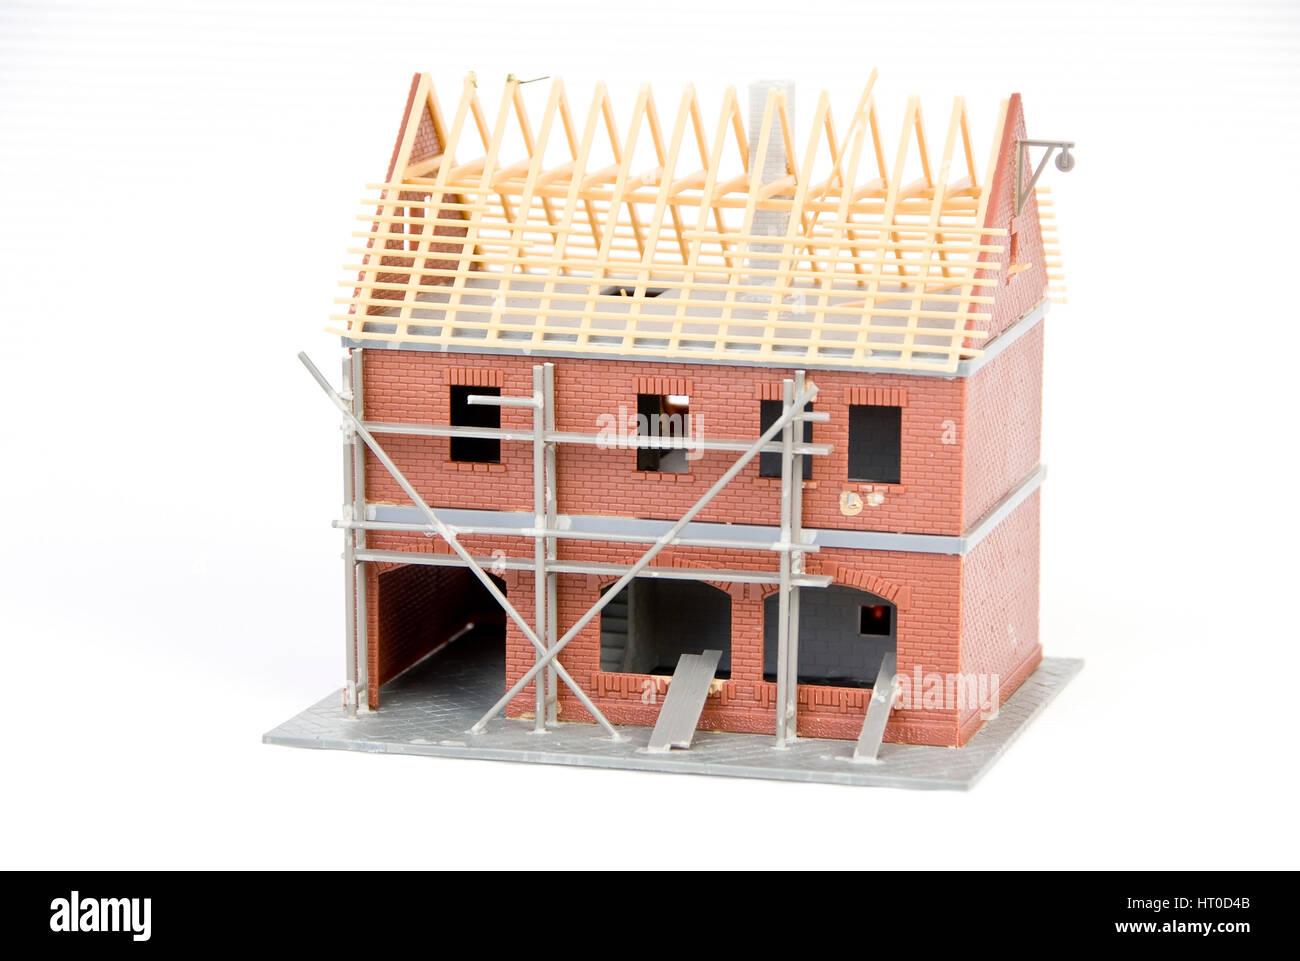 Rohbau - bare brickwork - Stock Image